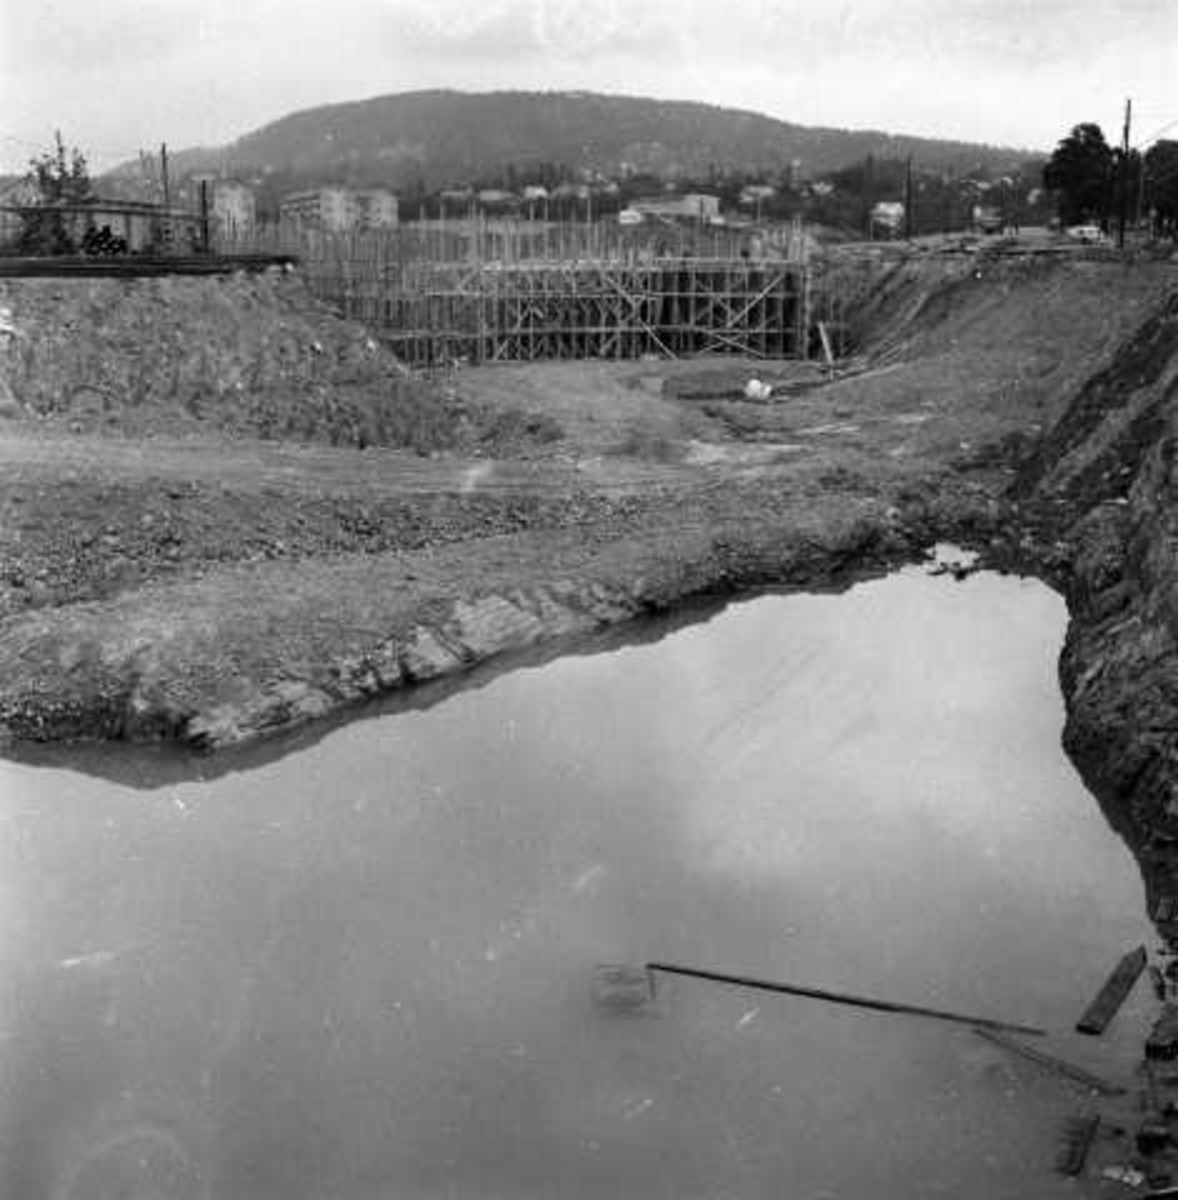 Sinsenkrysset, Oslo 1956. Under utbygging.